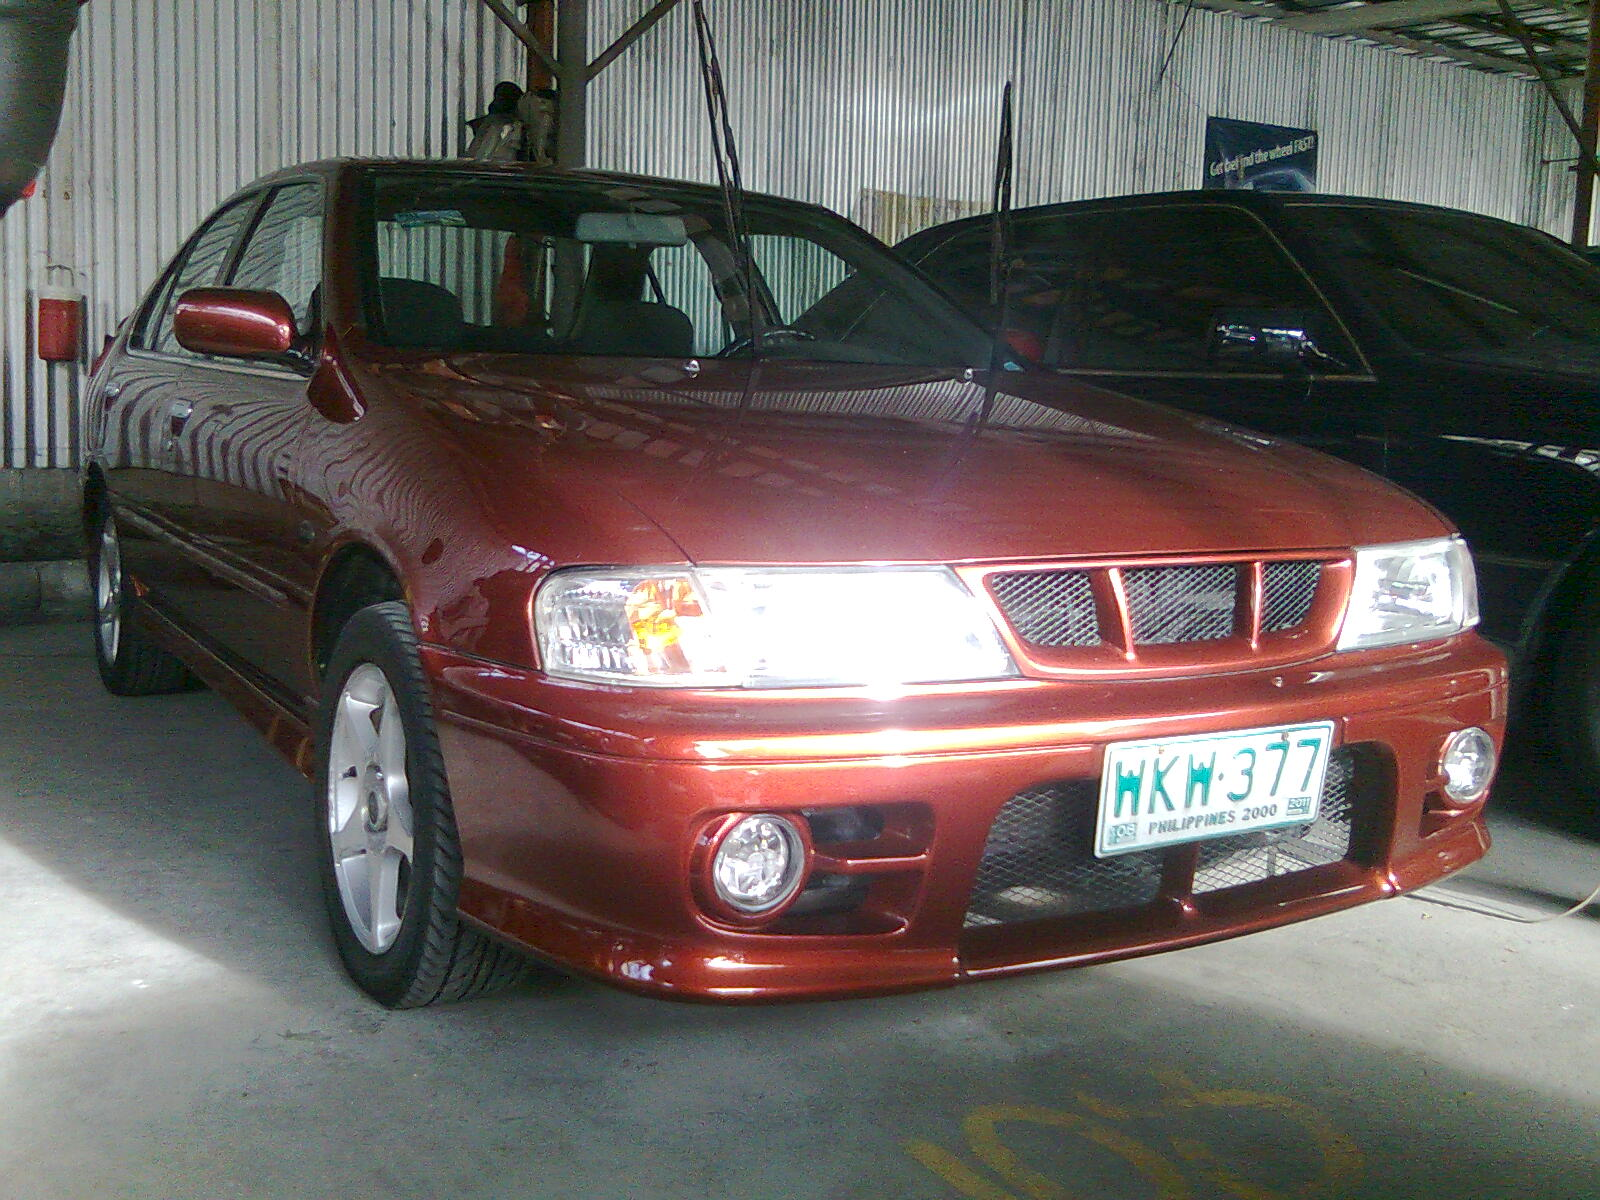 car repair: nissan sentra - generation 4.2 (1997-2000)